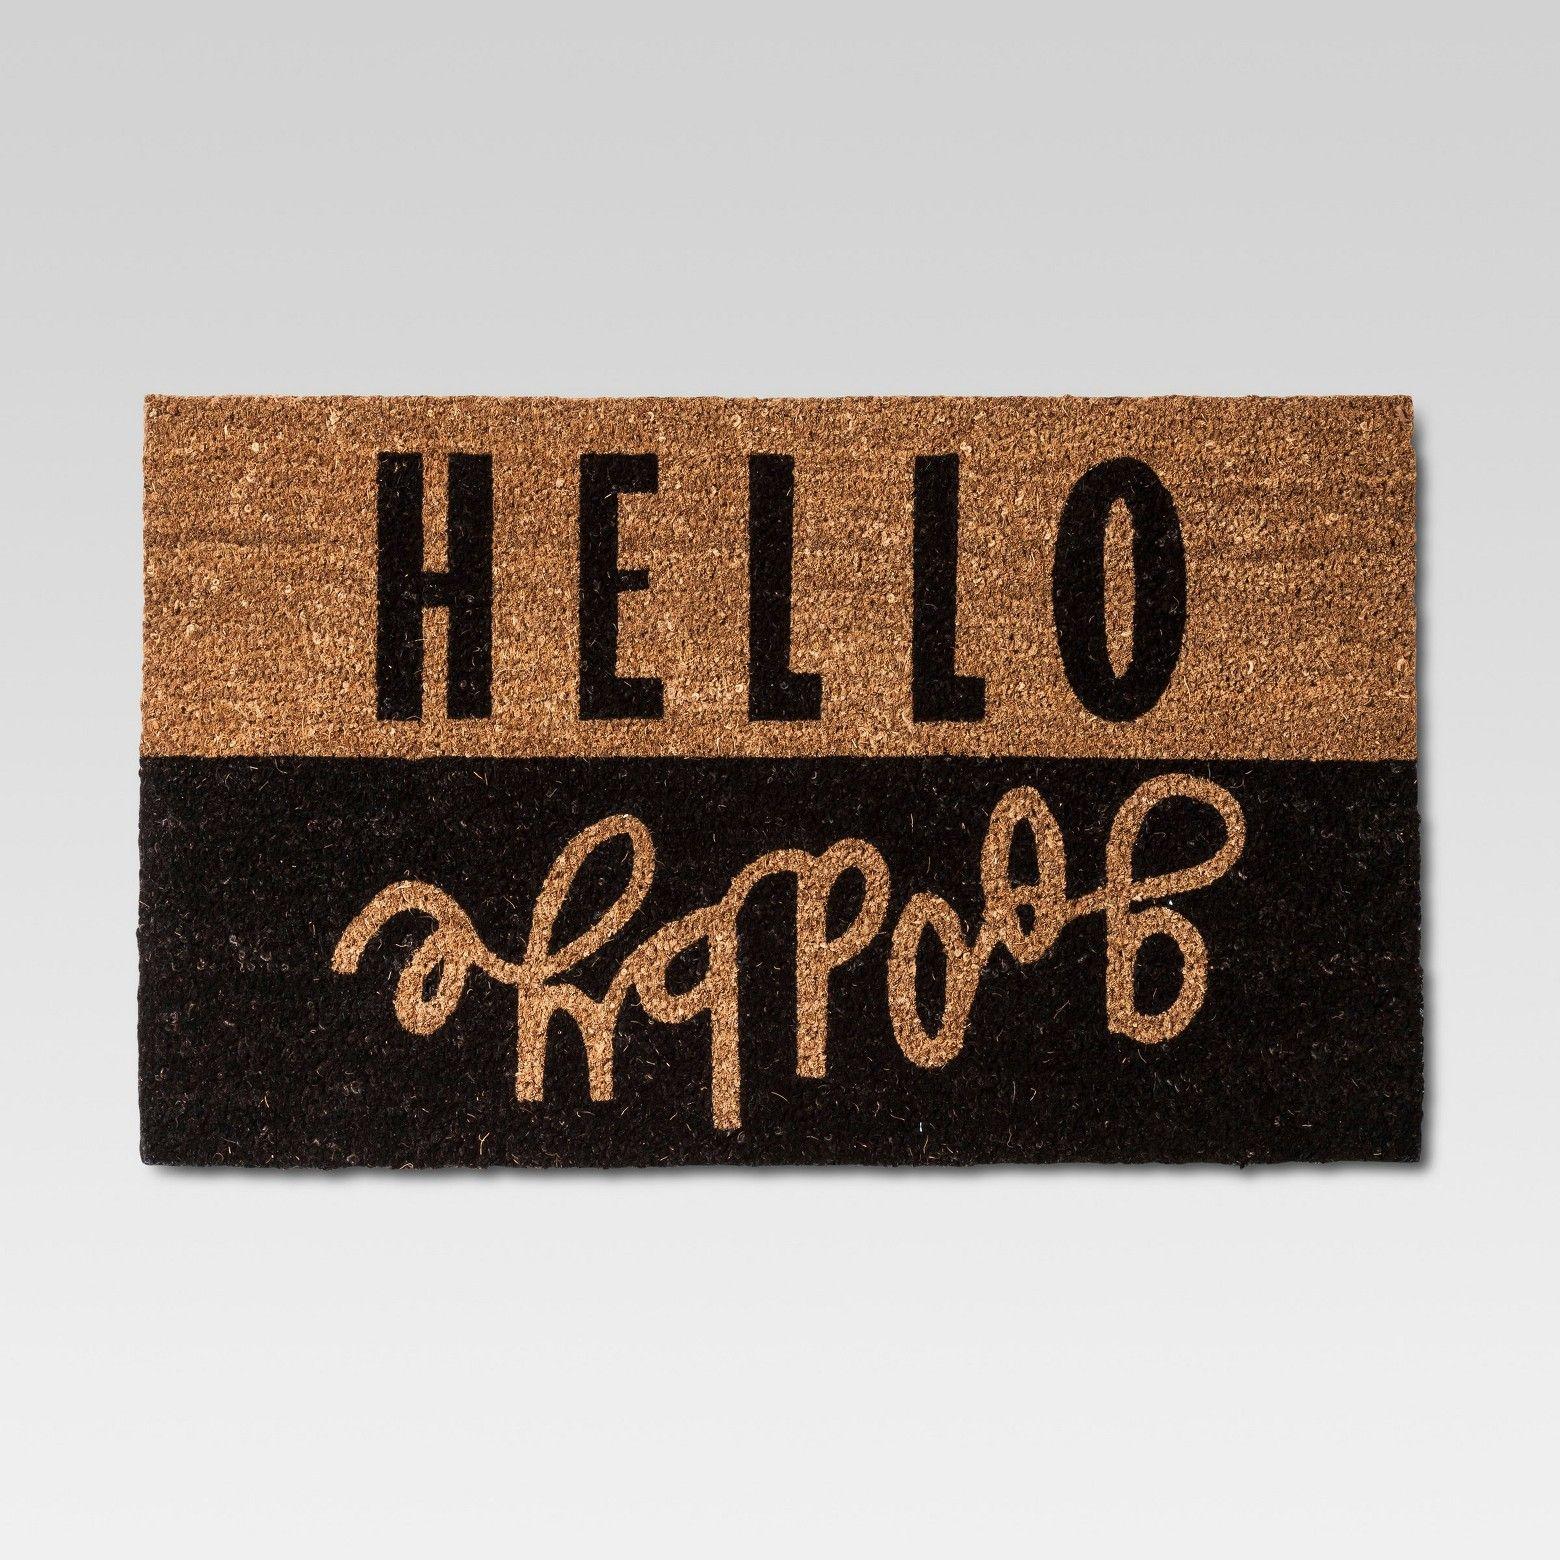 Hello Goodbye Doormat Only $10.39 (Reg $12.99) + Free Store Pickup at Target.com!